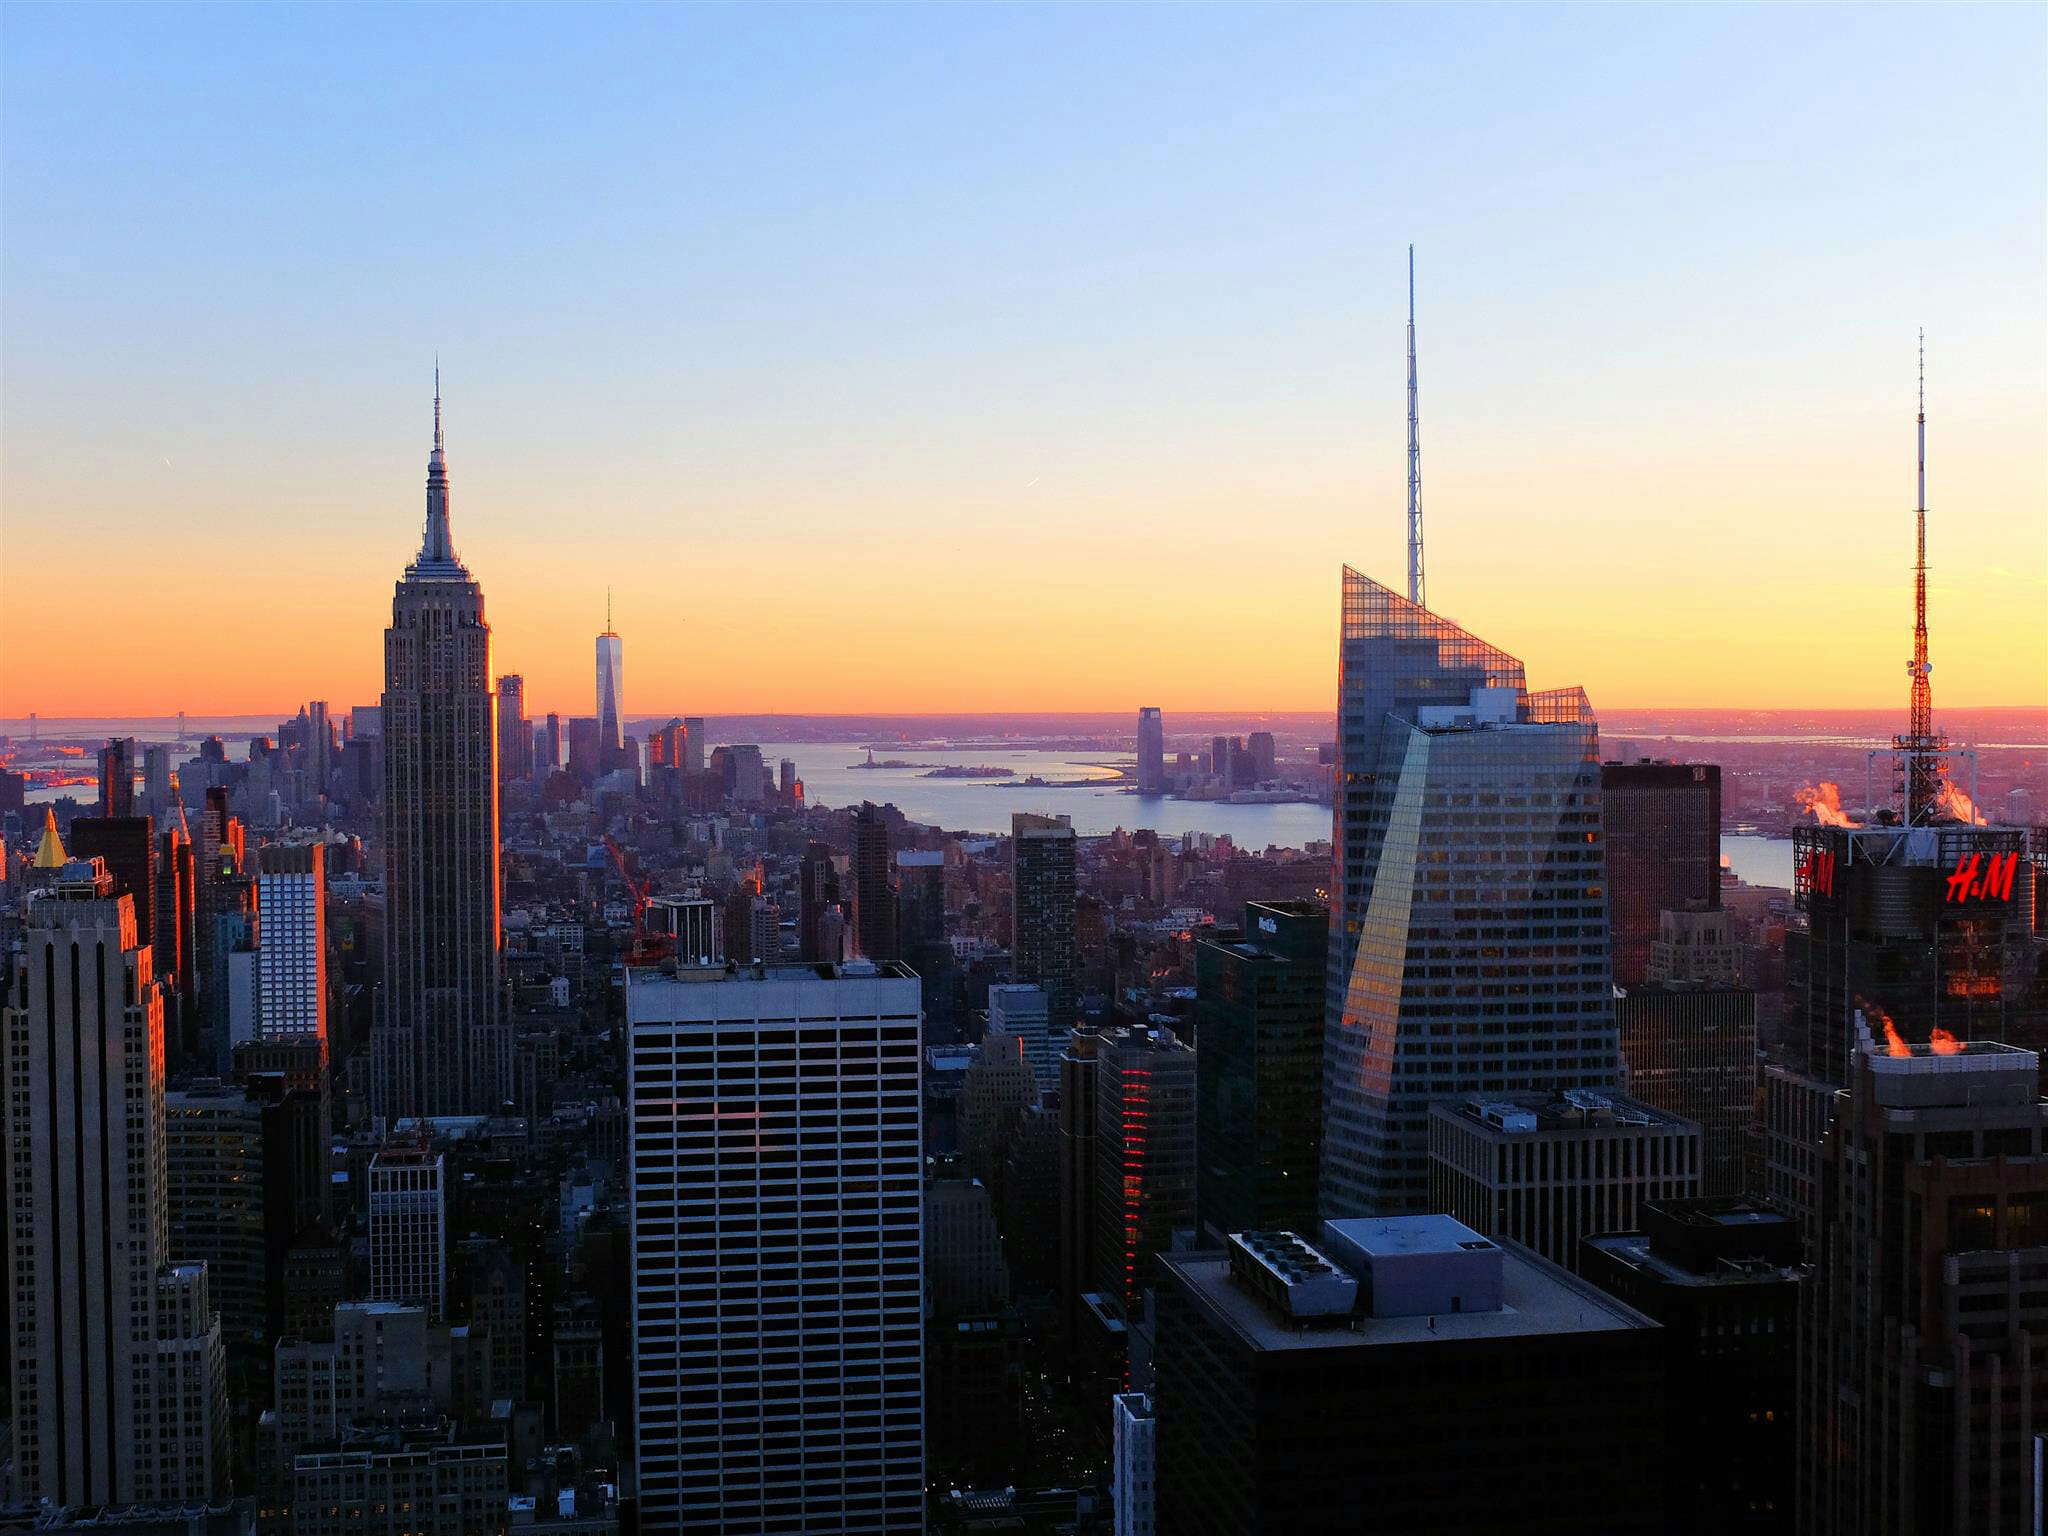 Empire State Building Skyline Susnet High Quality Wallpaper